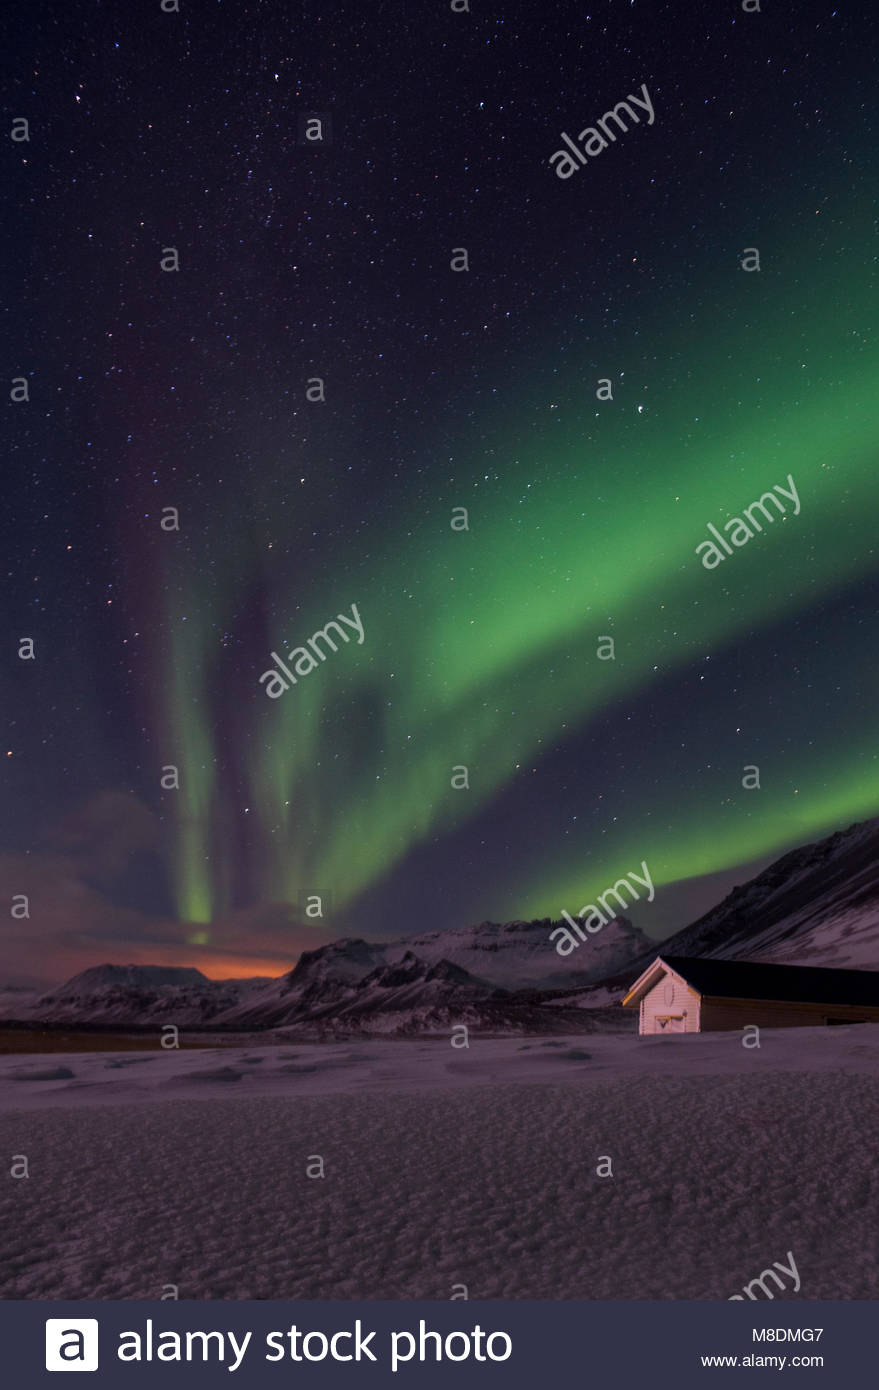 Aurora borealis over snow covered landscape, Snaefellsnes peninsula, Iceland, Europe - Stock Image